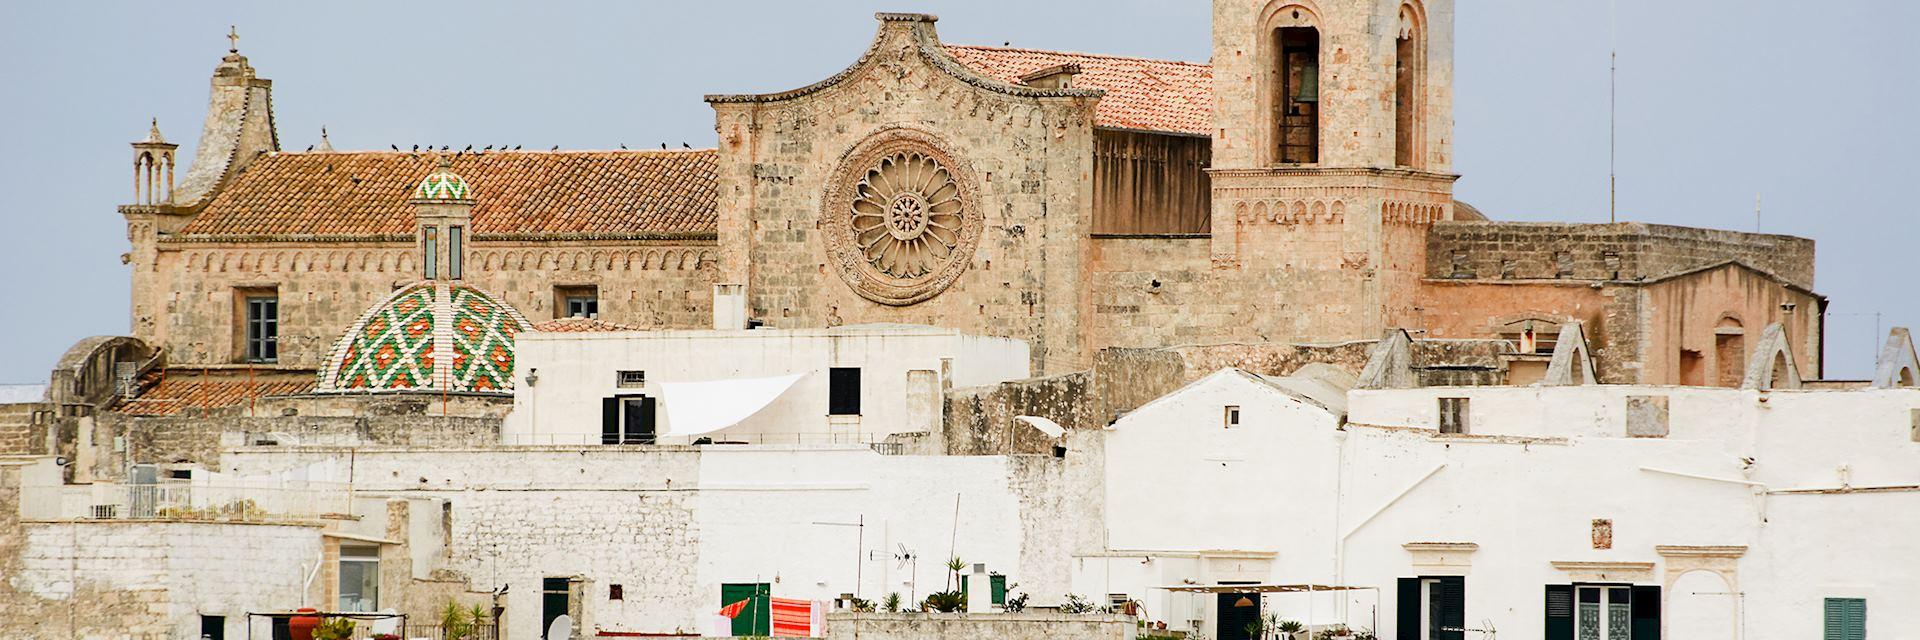 Santa Maria Assunta cathedral, Ostuni